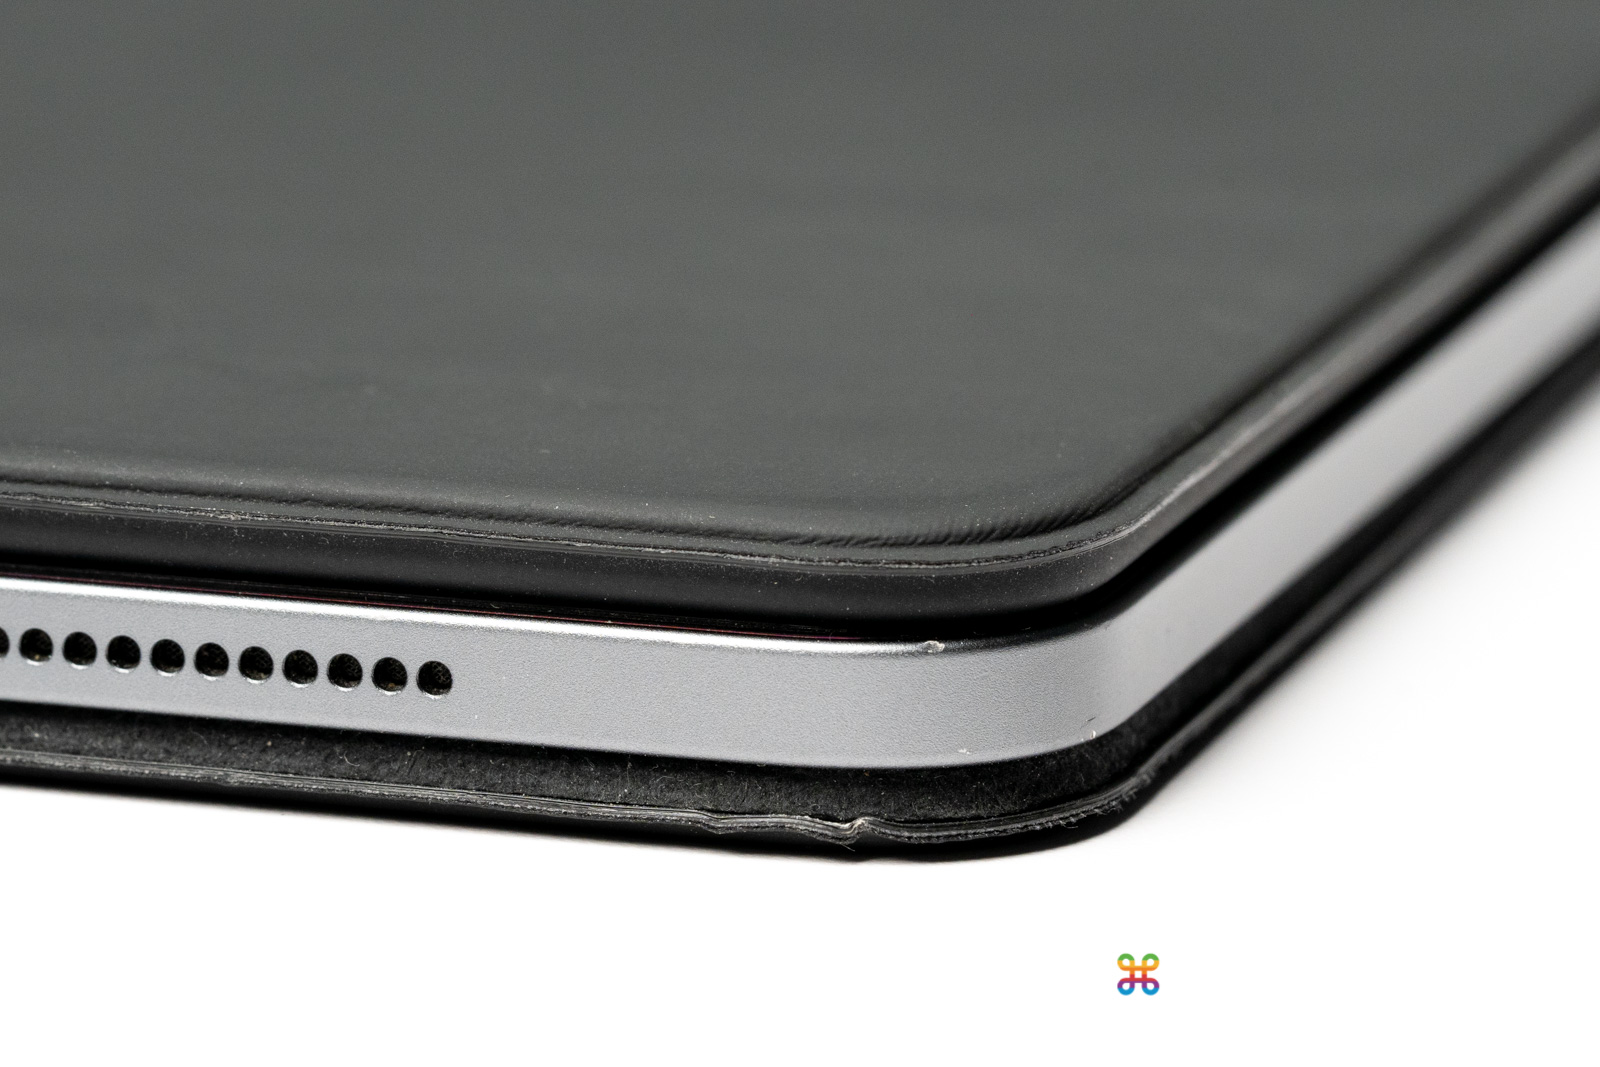 iPad 的邊角受傷了